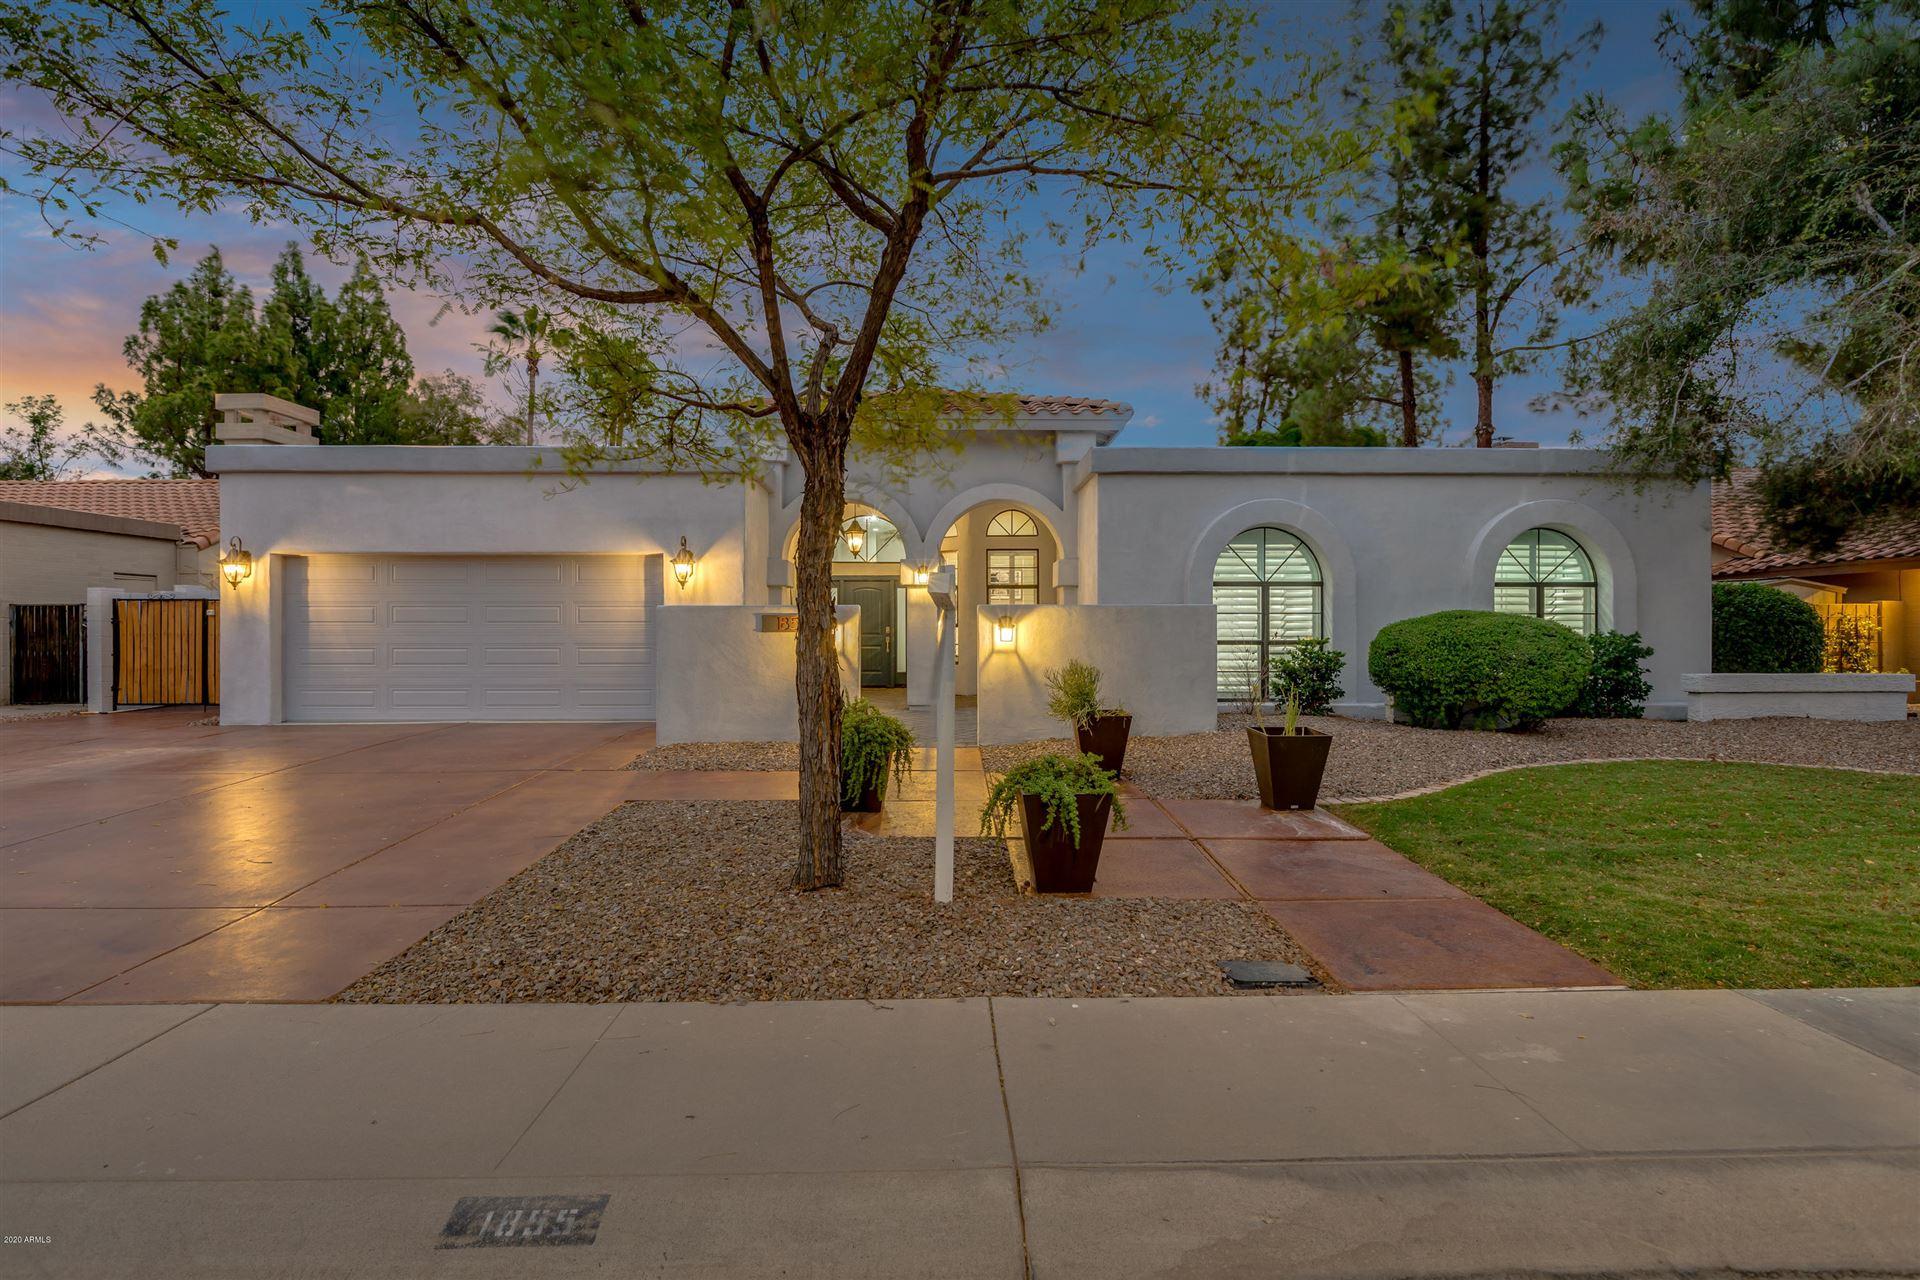 1855 E GREENTREE Drive, Tempe, AZ 85284 - MLS#: 6130561